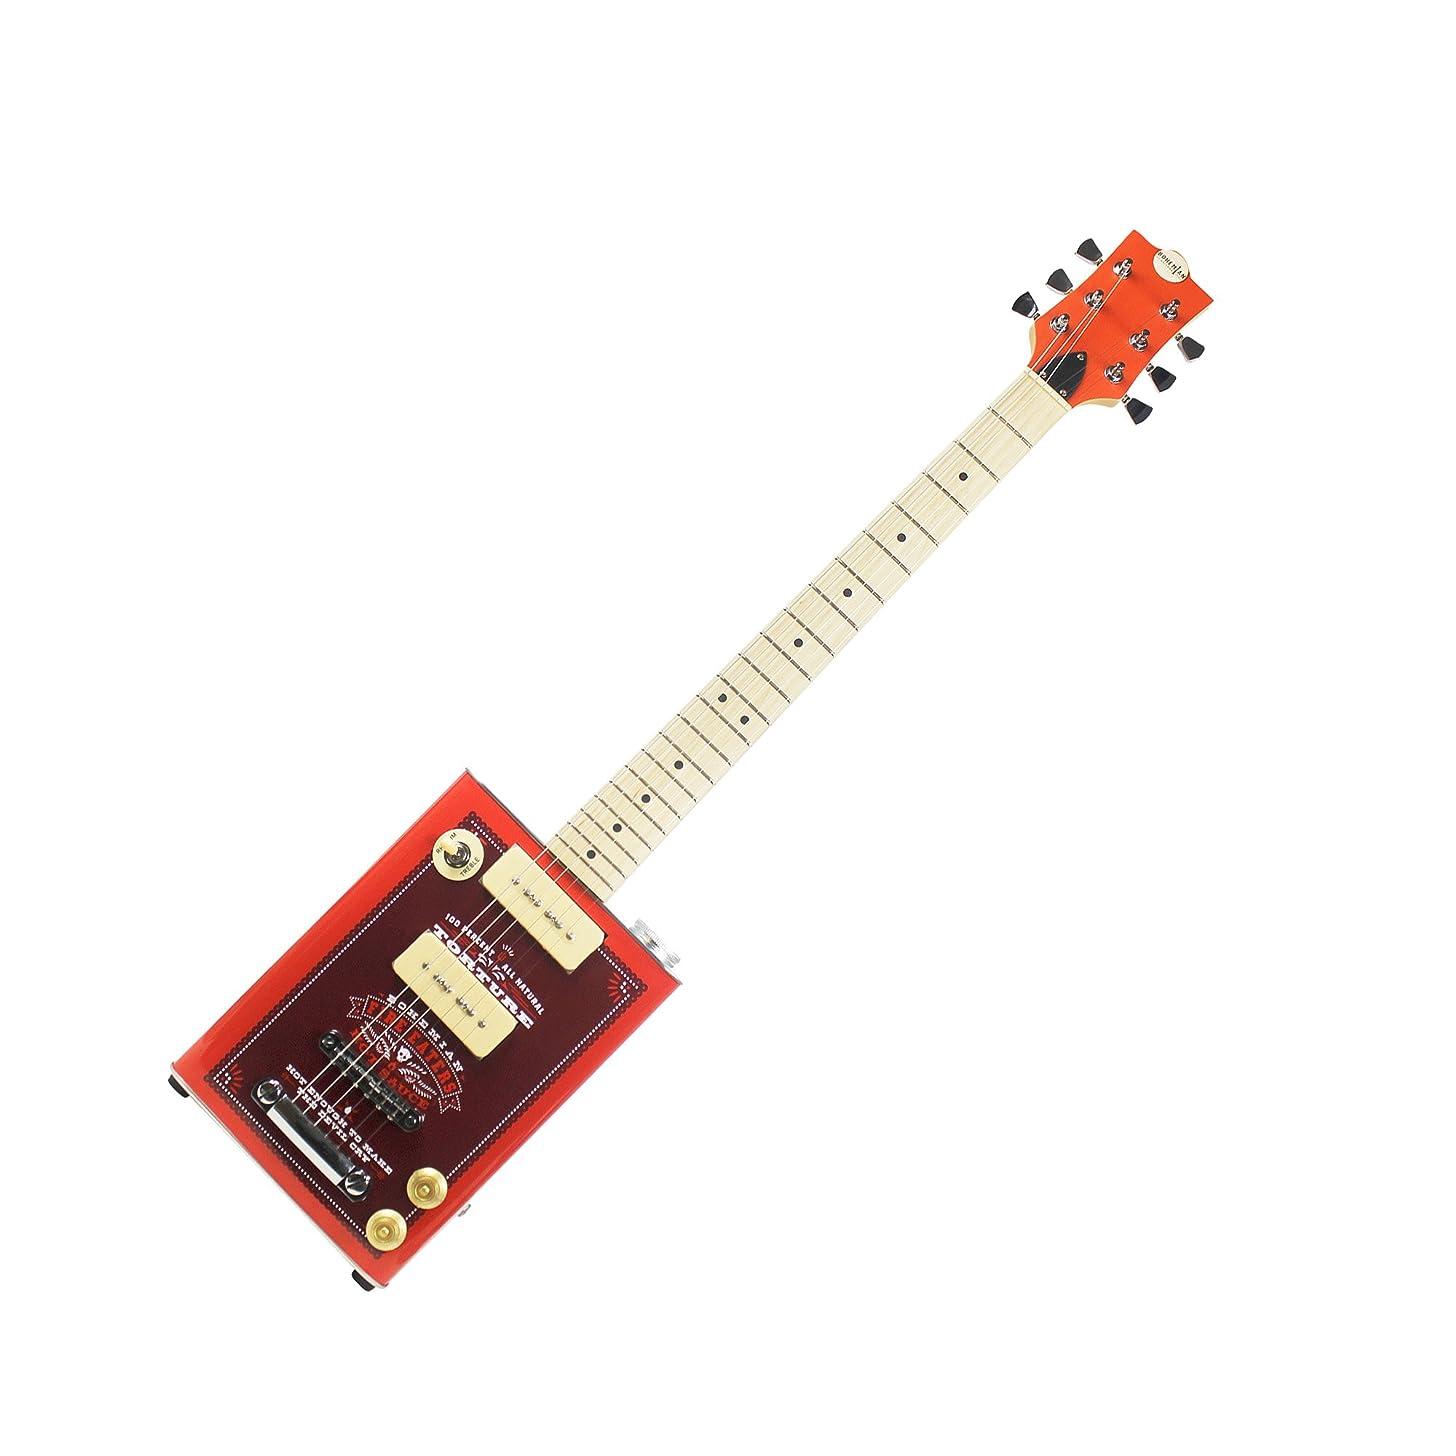 Bohemian Guitars - Boho Series - Bohemian Hot Sauce - Electric Oil Can Hollow Body Guitar - 2 x P90